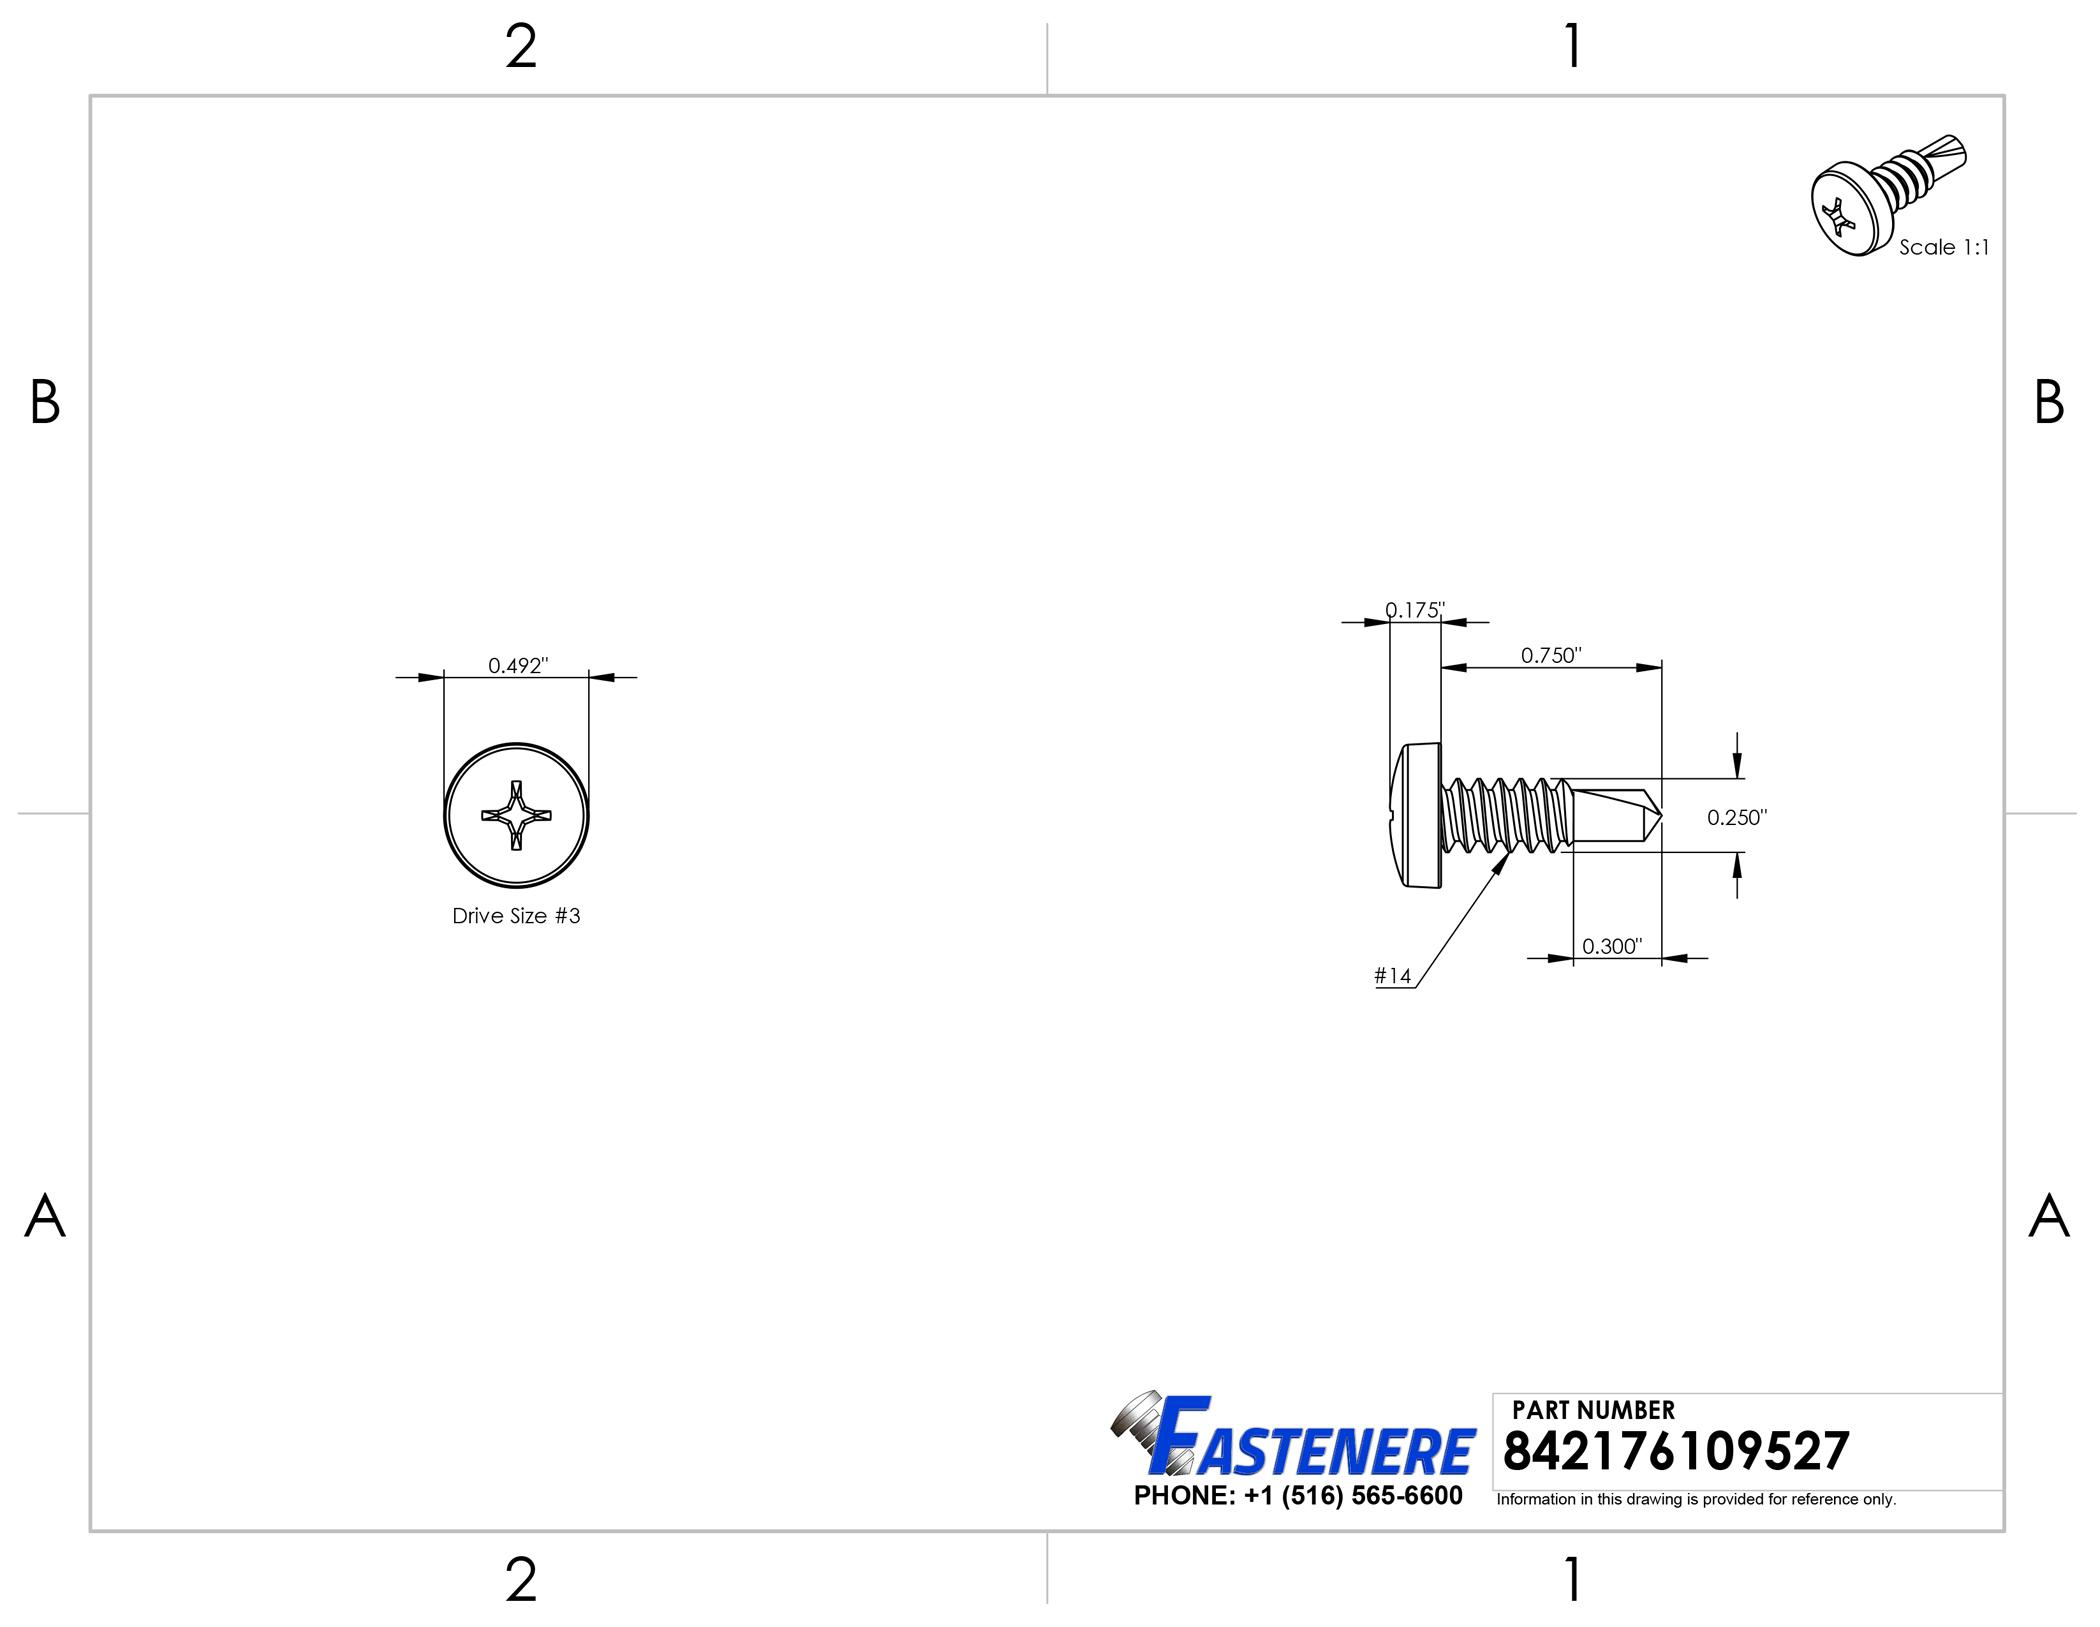 Stainless Steel Square Drive Truss Head Sheet Metal Screw #10 x 3//4 Qty 250